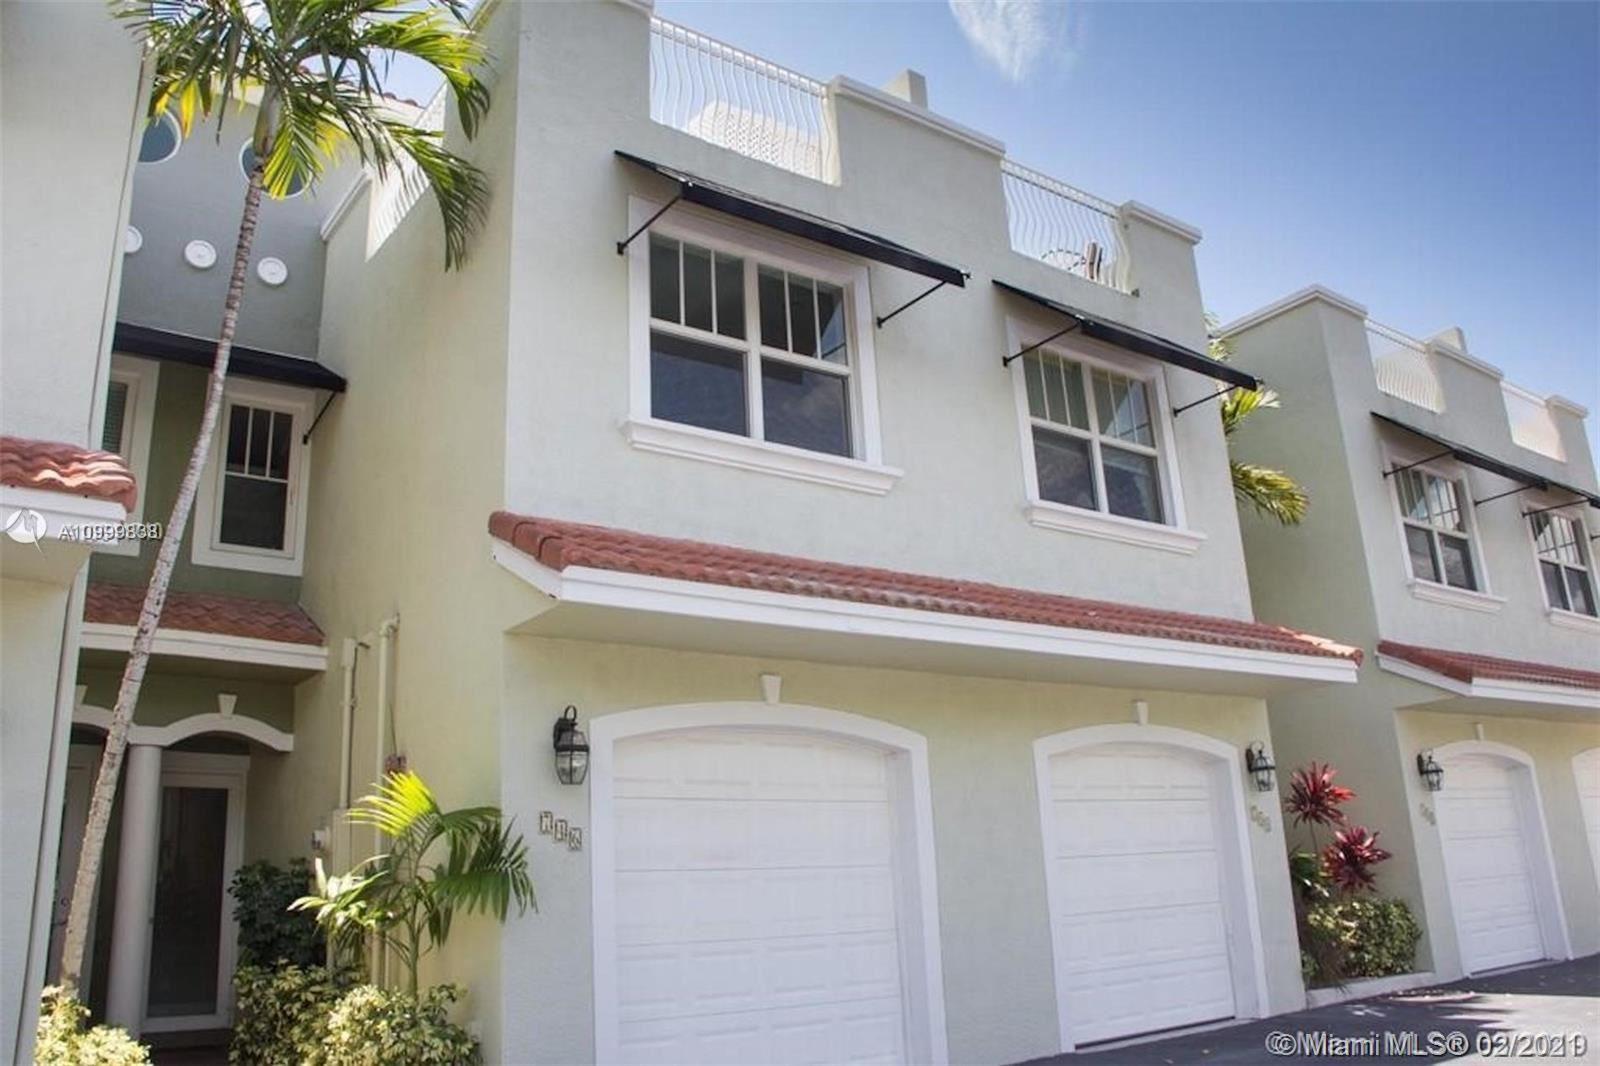 746 NE 7th Ave, Fort Lauderdale, FL 33304 - #: A10999838